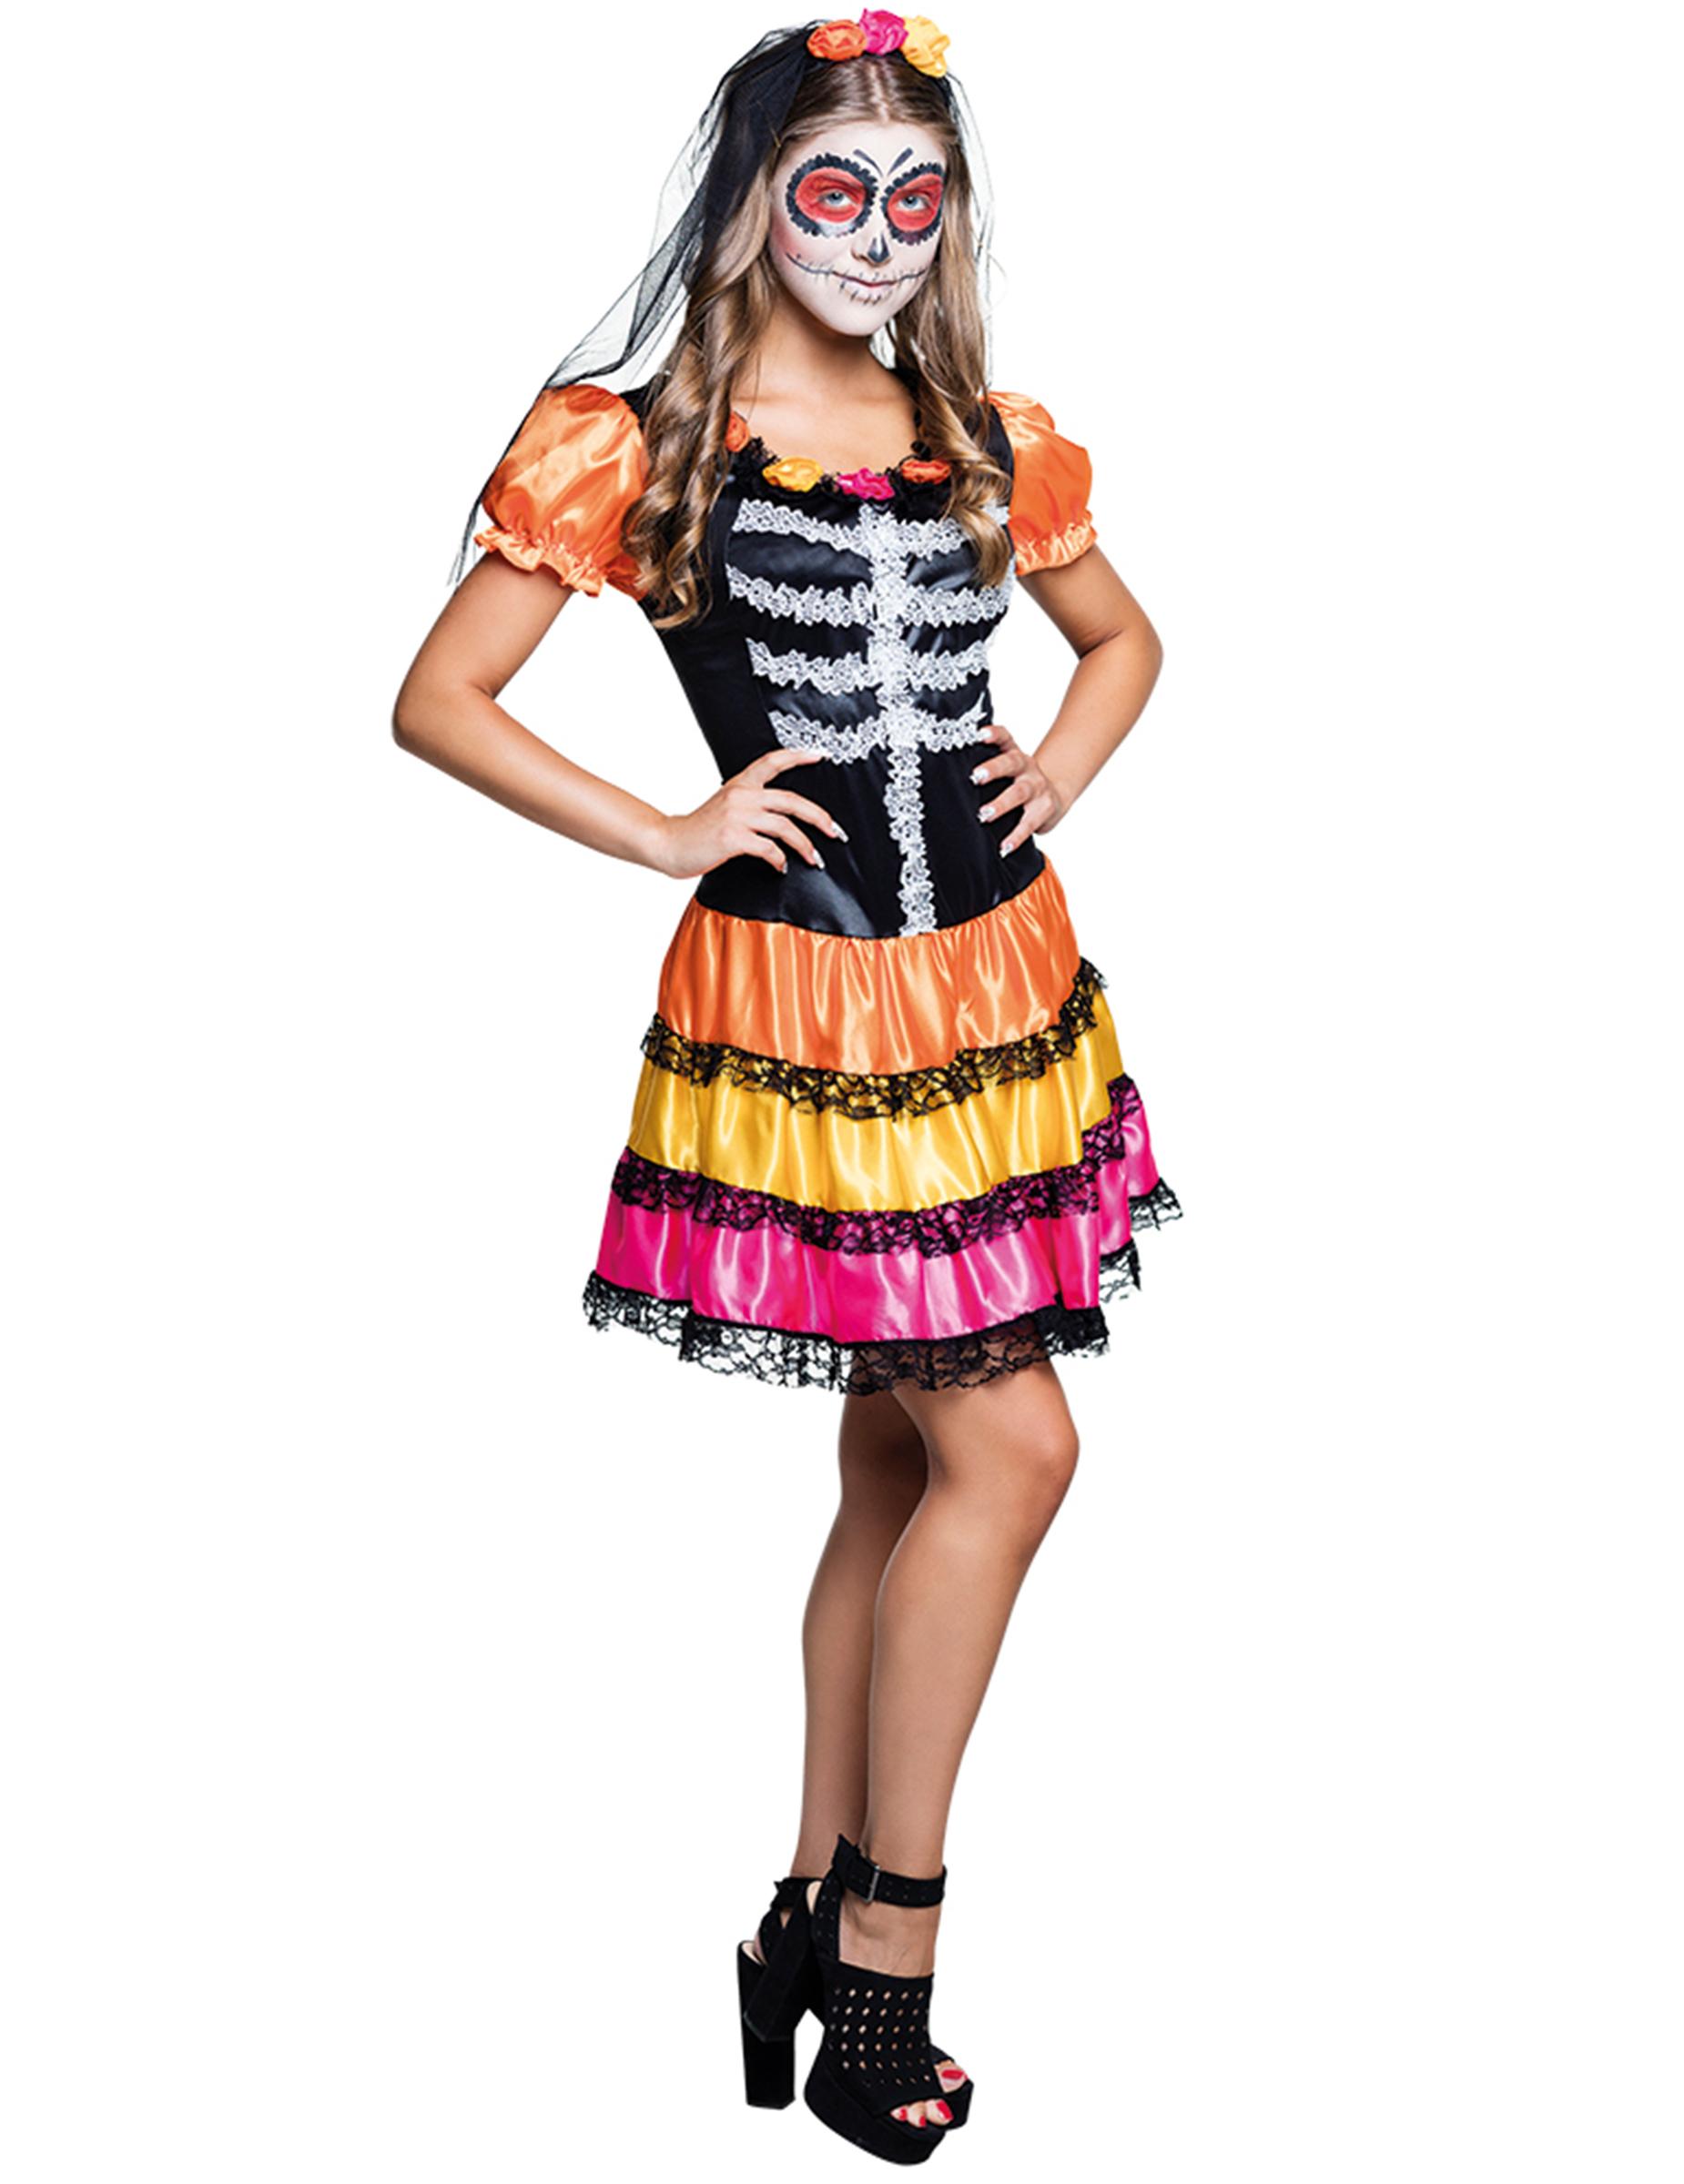 dia de los muertos teenager-kostüm skelett , günstige